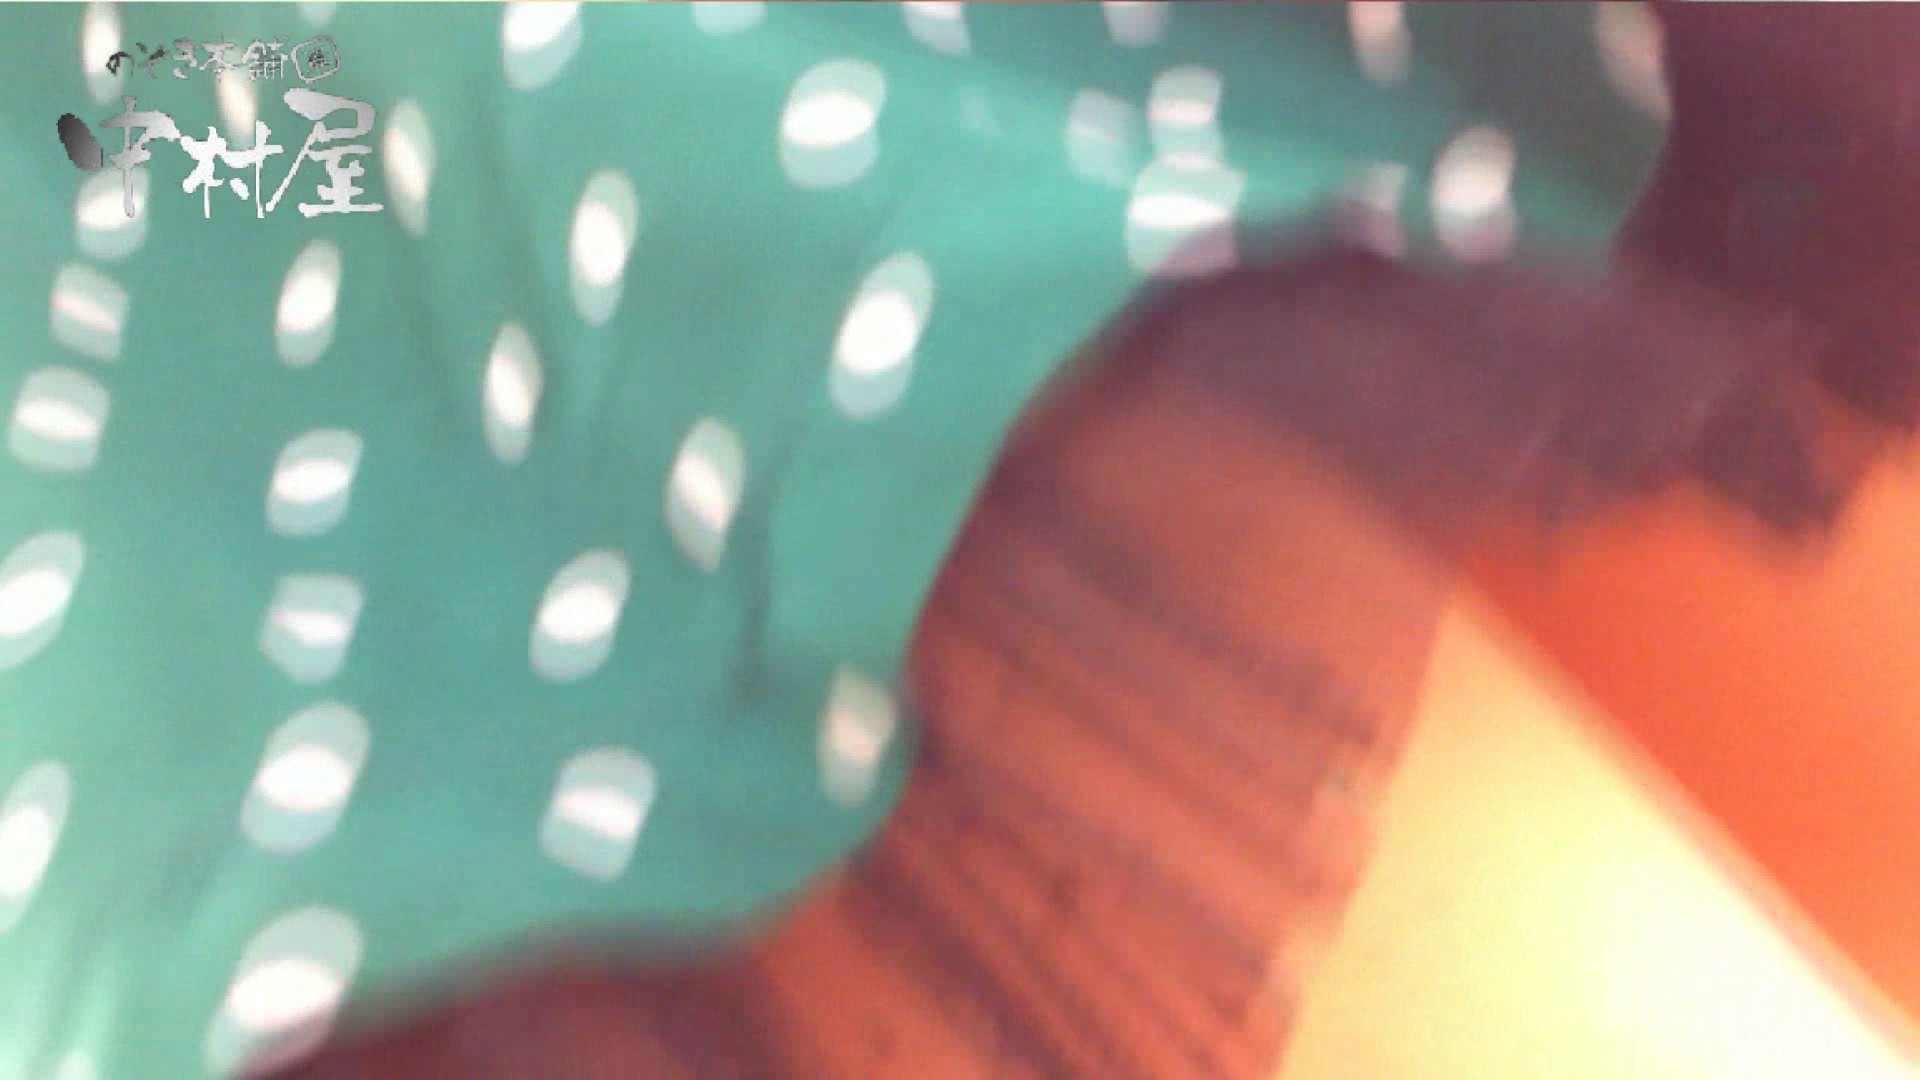 vol.48可愛いカリスマ店員胸チラ&パンチラ アニメ声の店員さん 胸チラ  96Pix 69